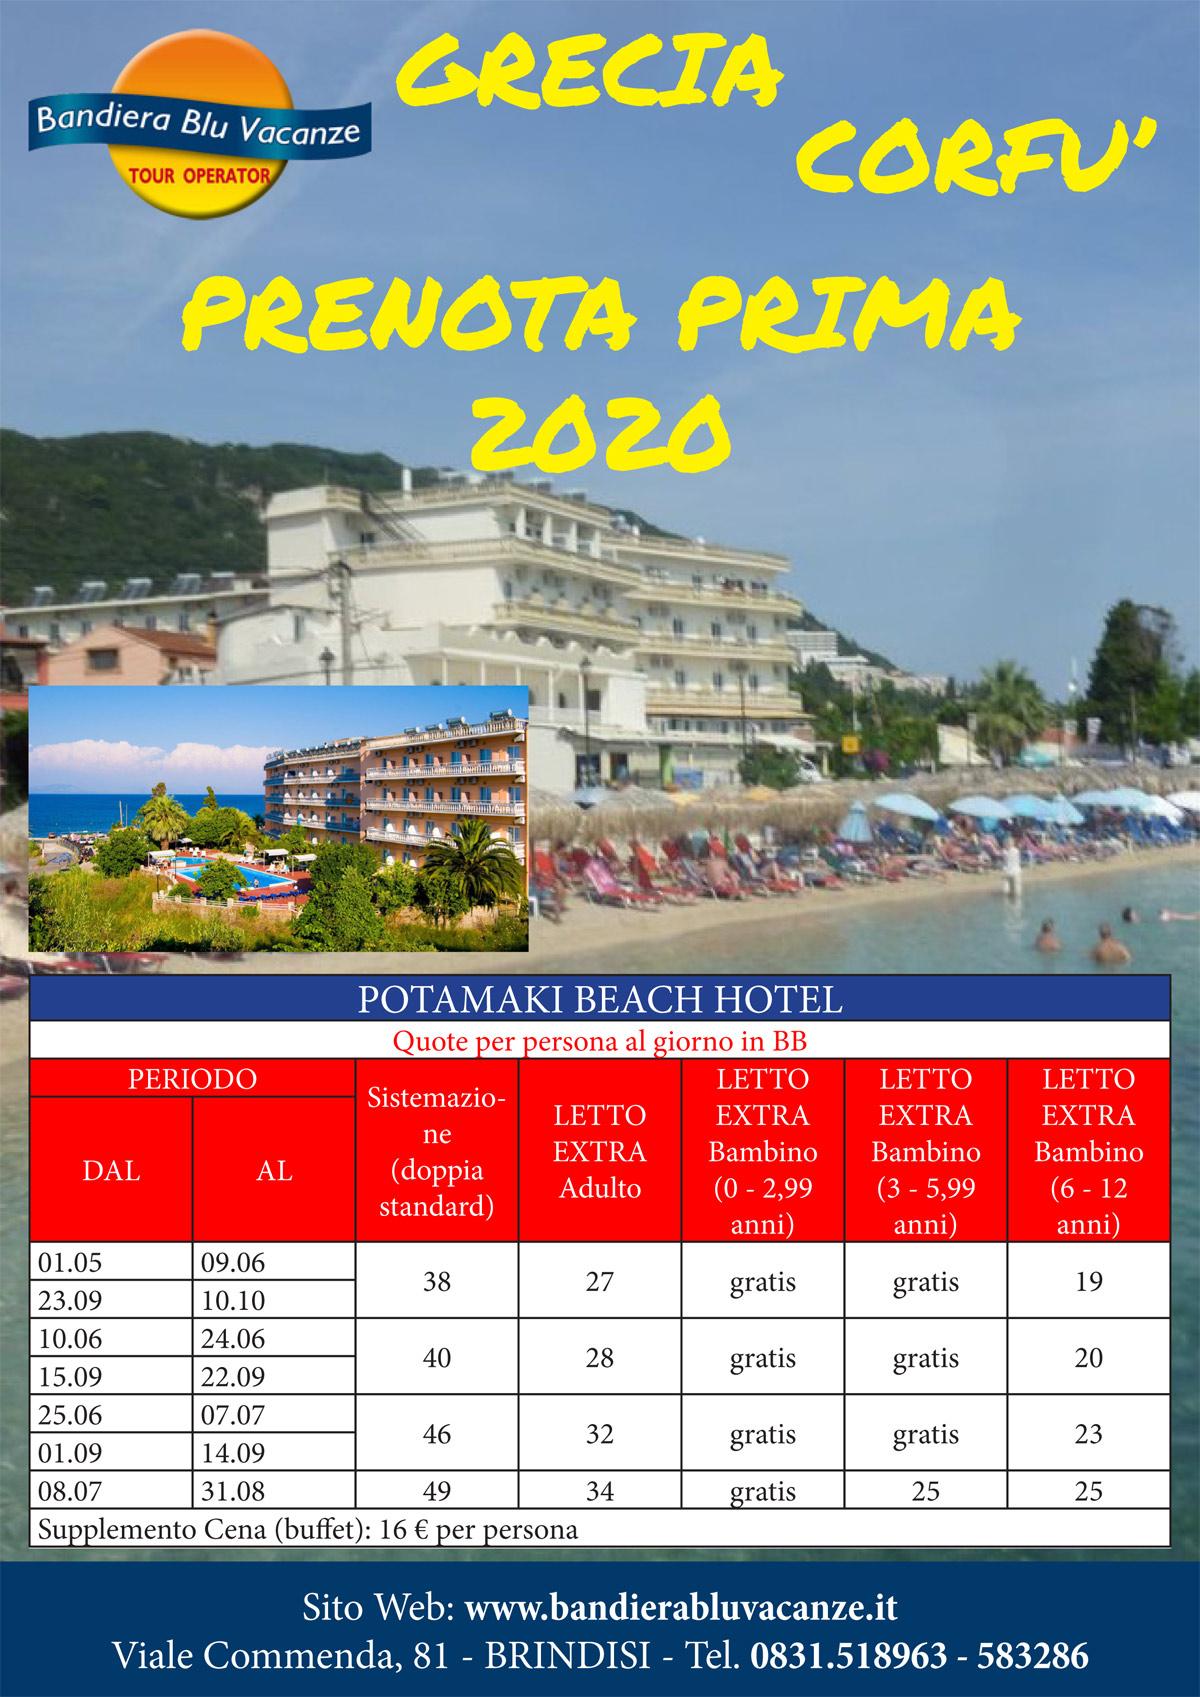 Corfù - Hotel Potamaki - Prenota Prima